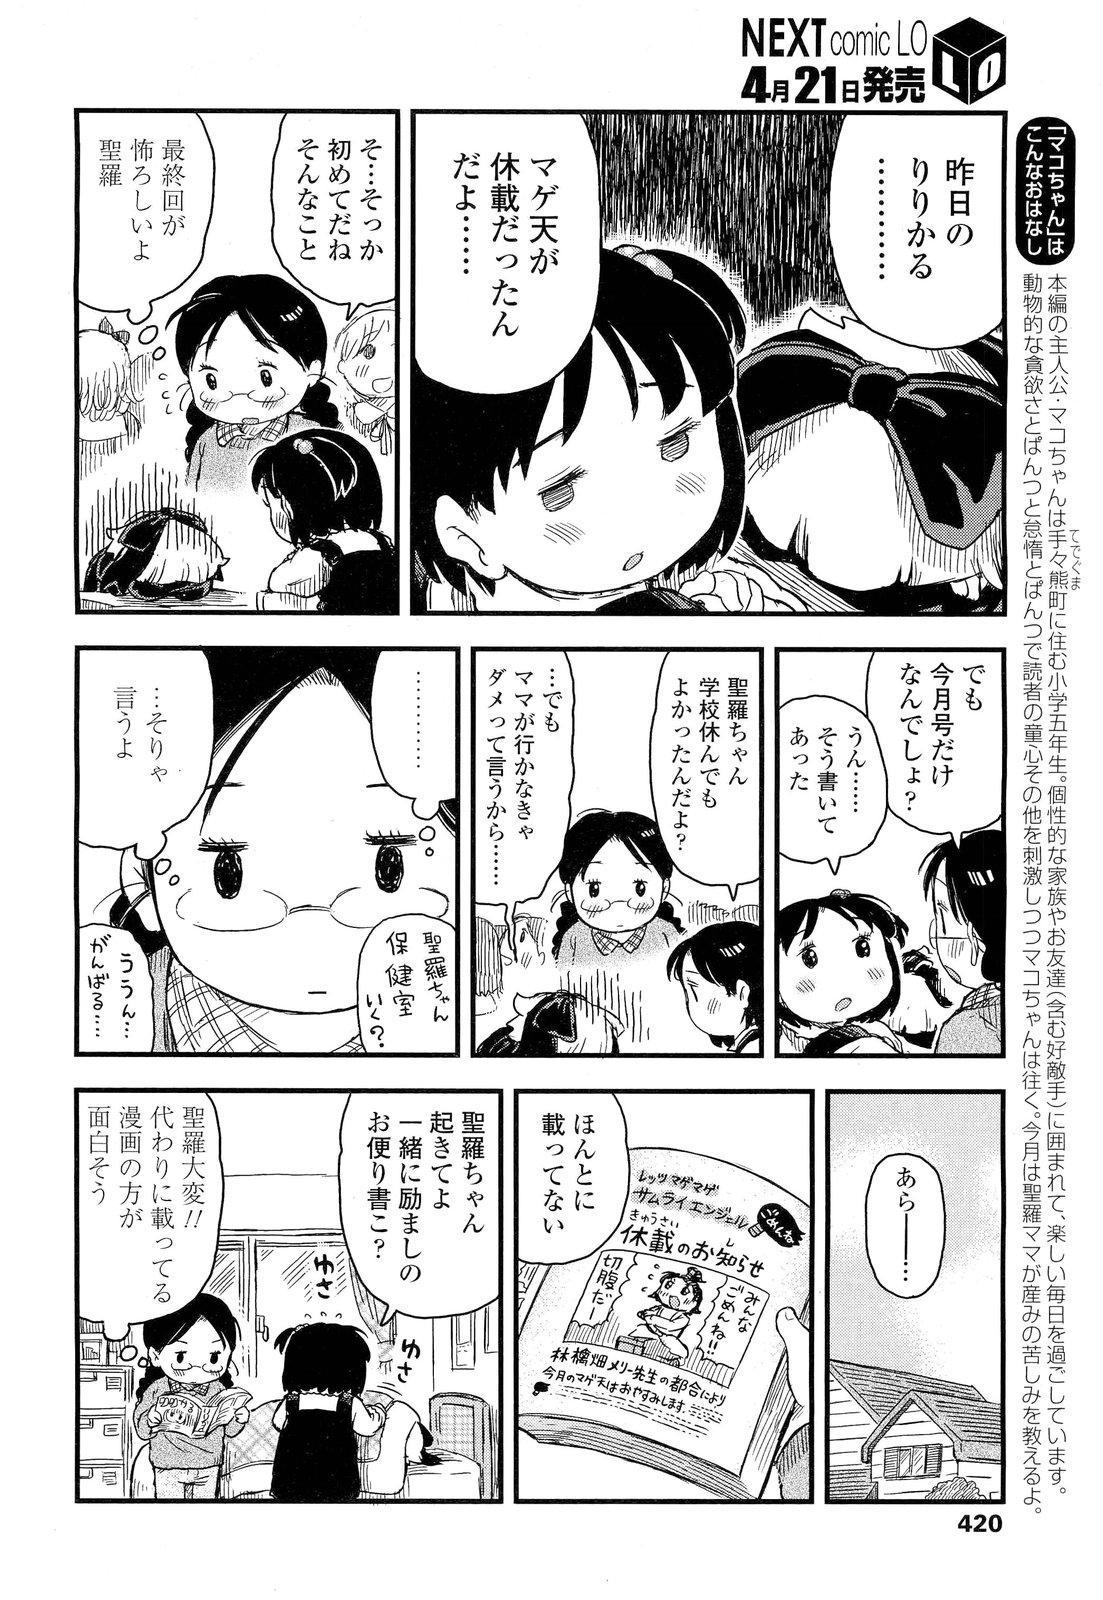 COMIC LO 2012-05 Vol. 98 419